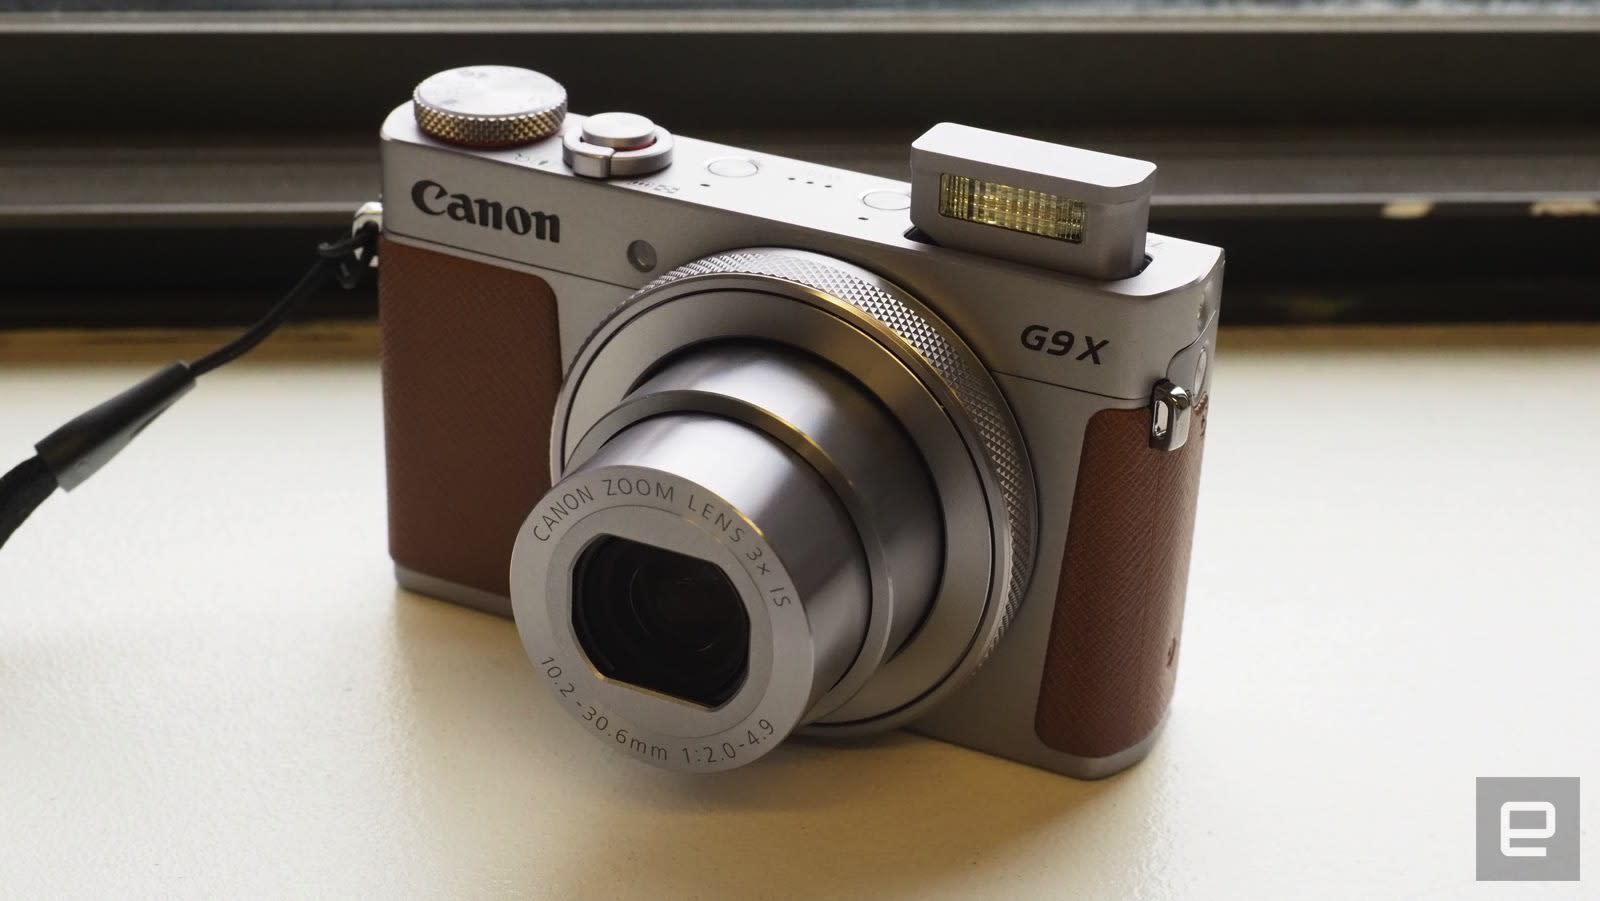 Canon G9X Mark II compact camera